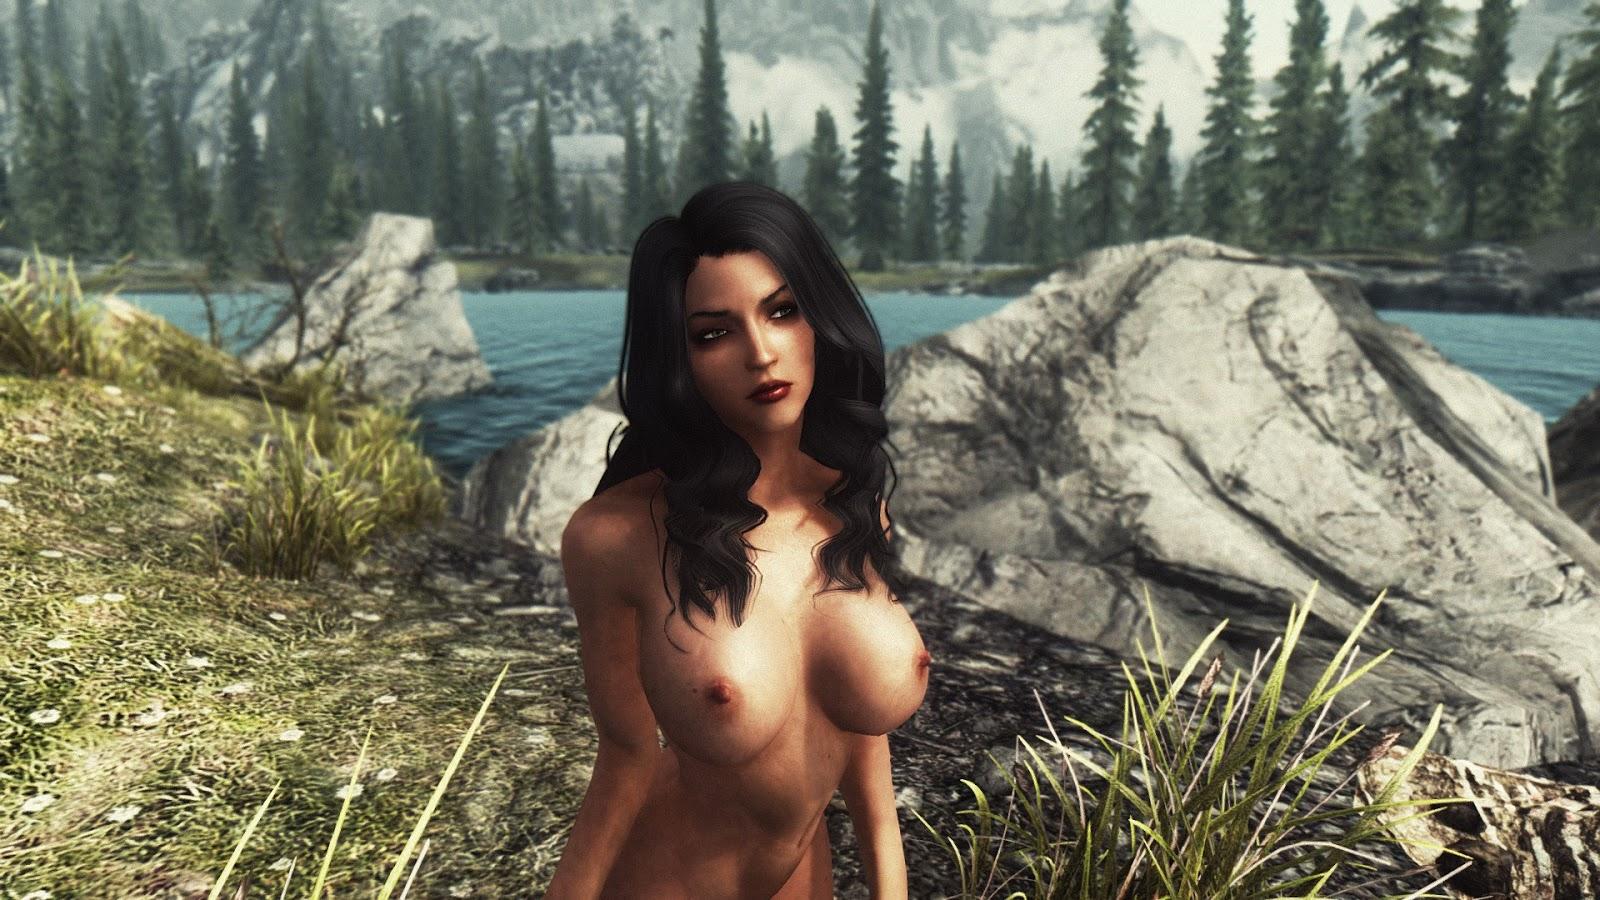 Skyrim naked mod pics nude videos